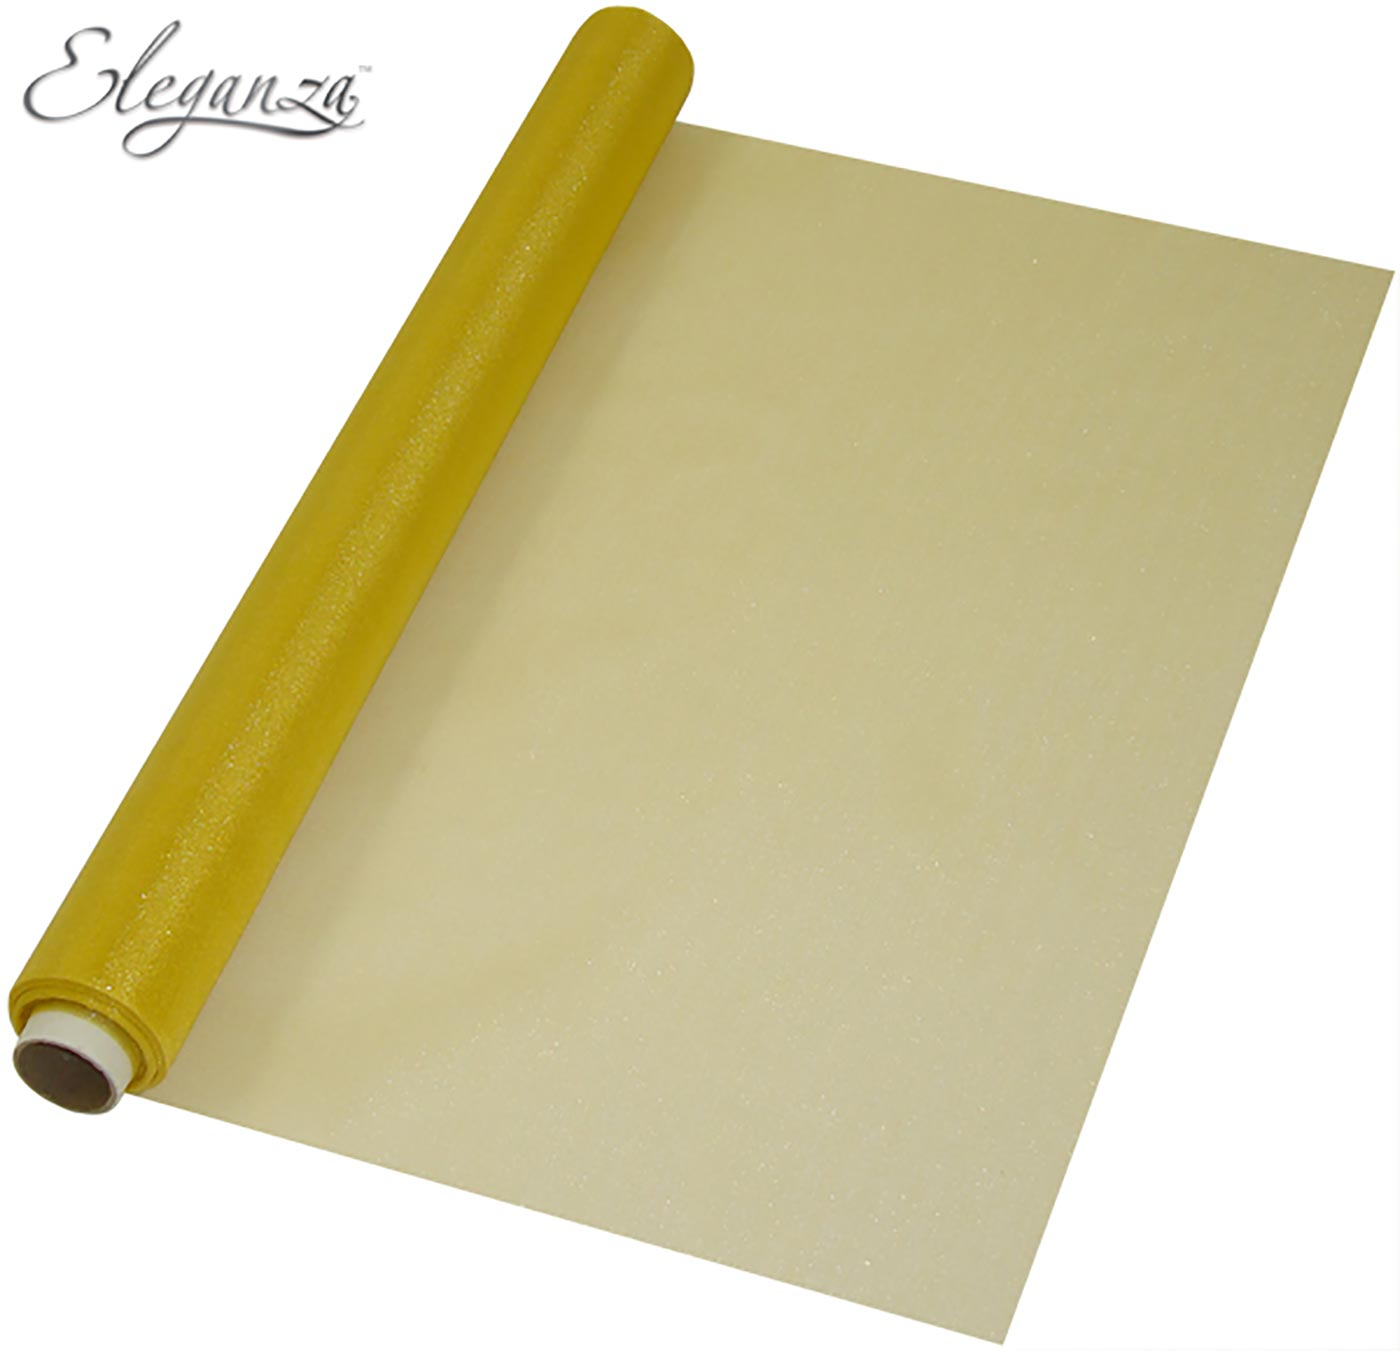 Eleganza Soft Sheer Organza 47cm x 10m No.35 Gold